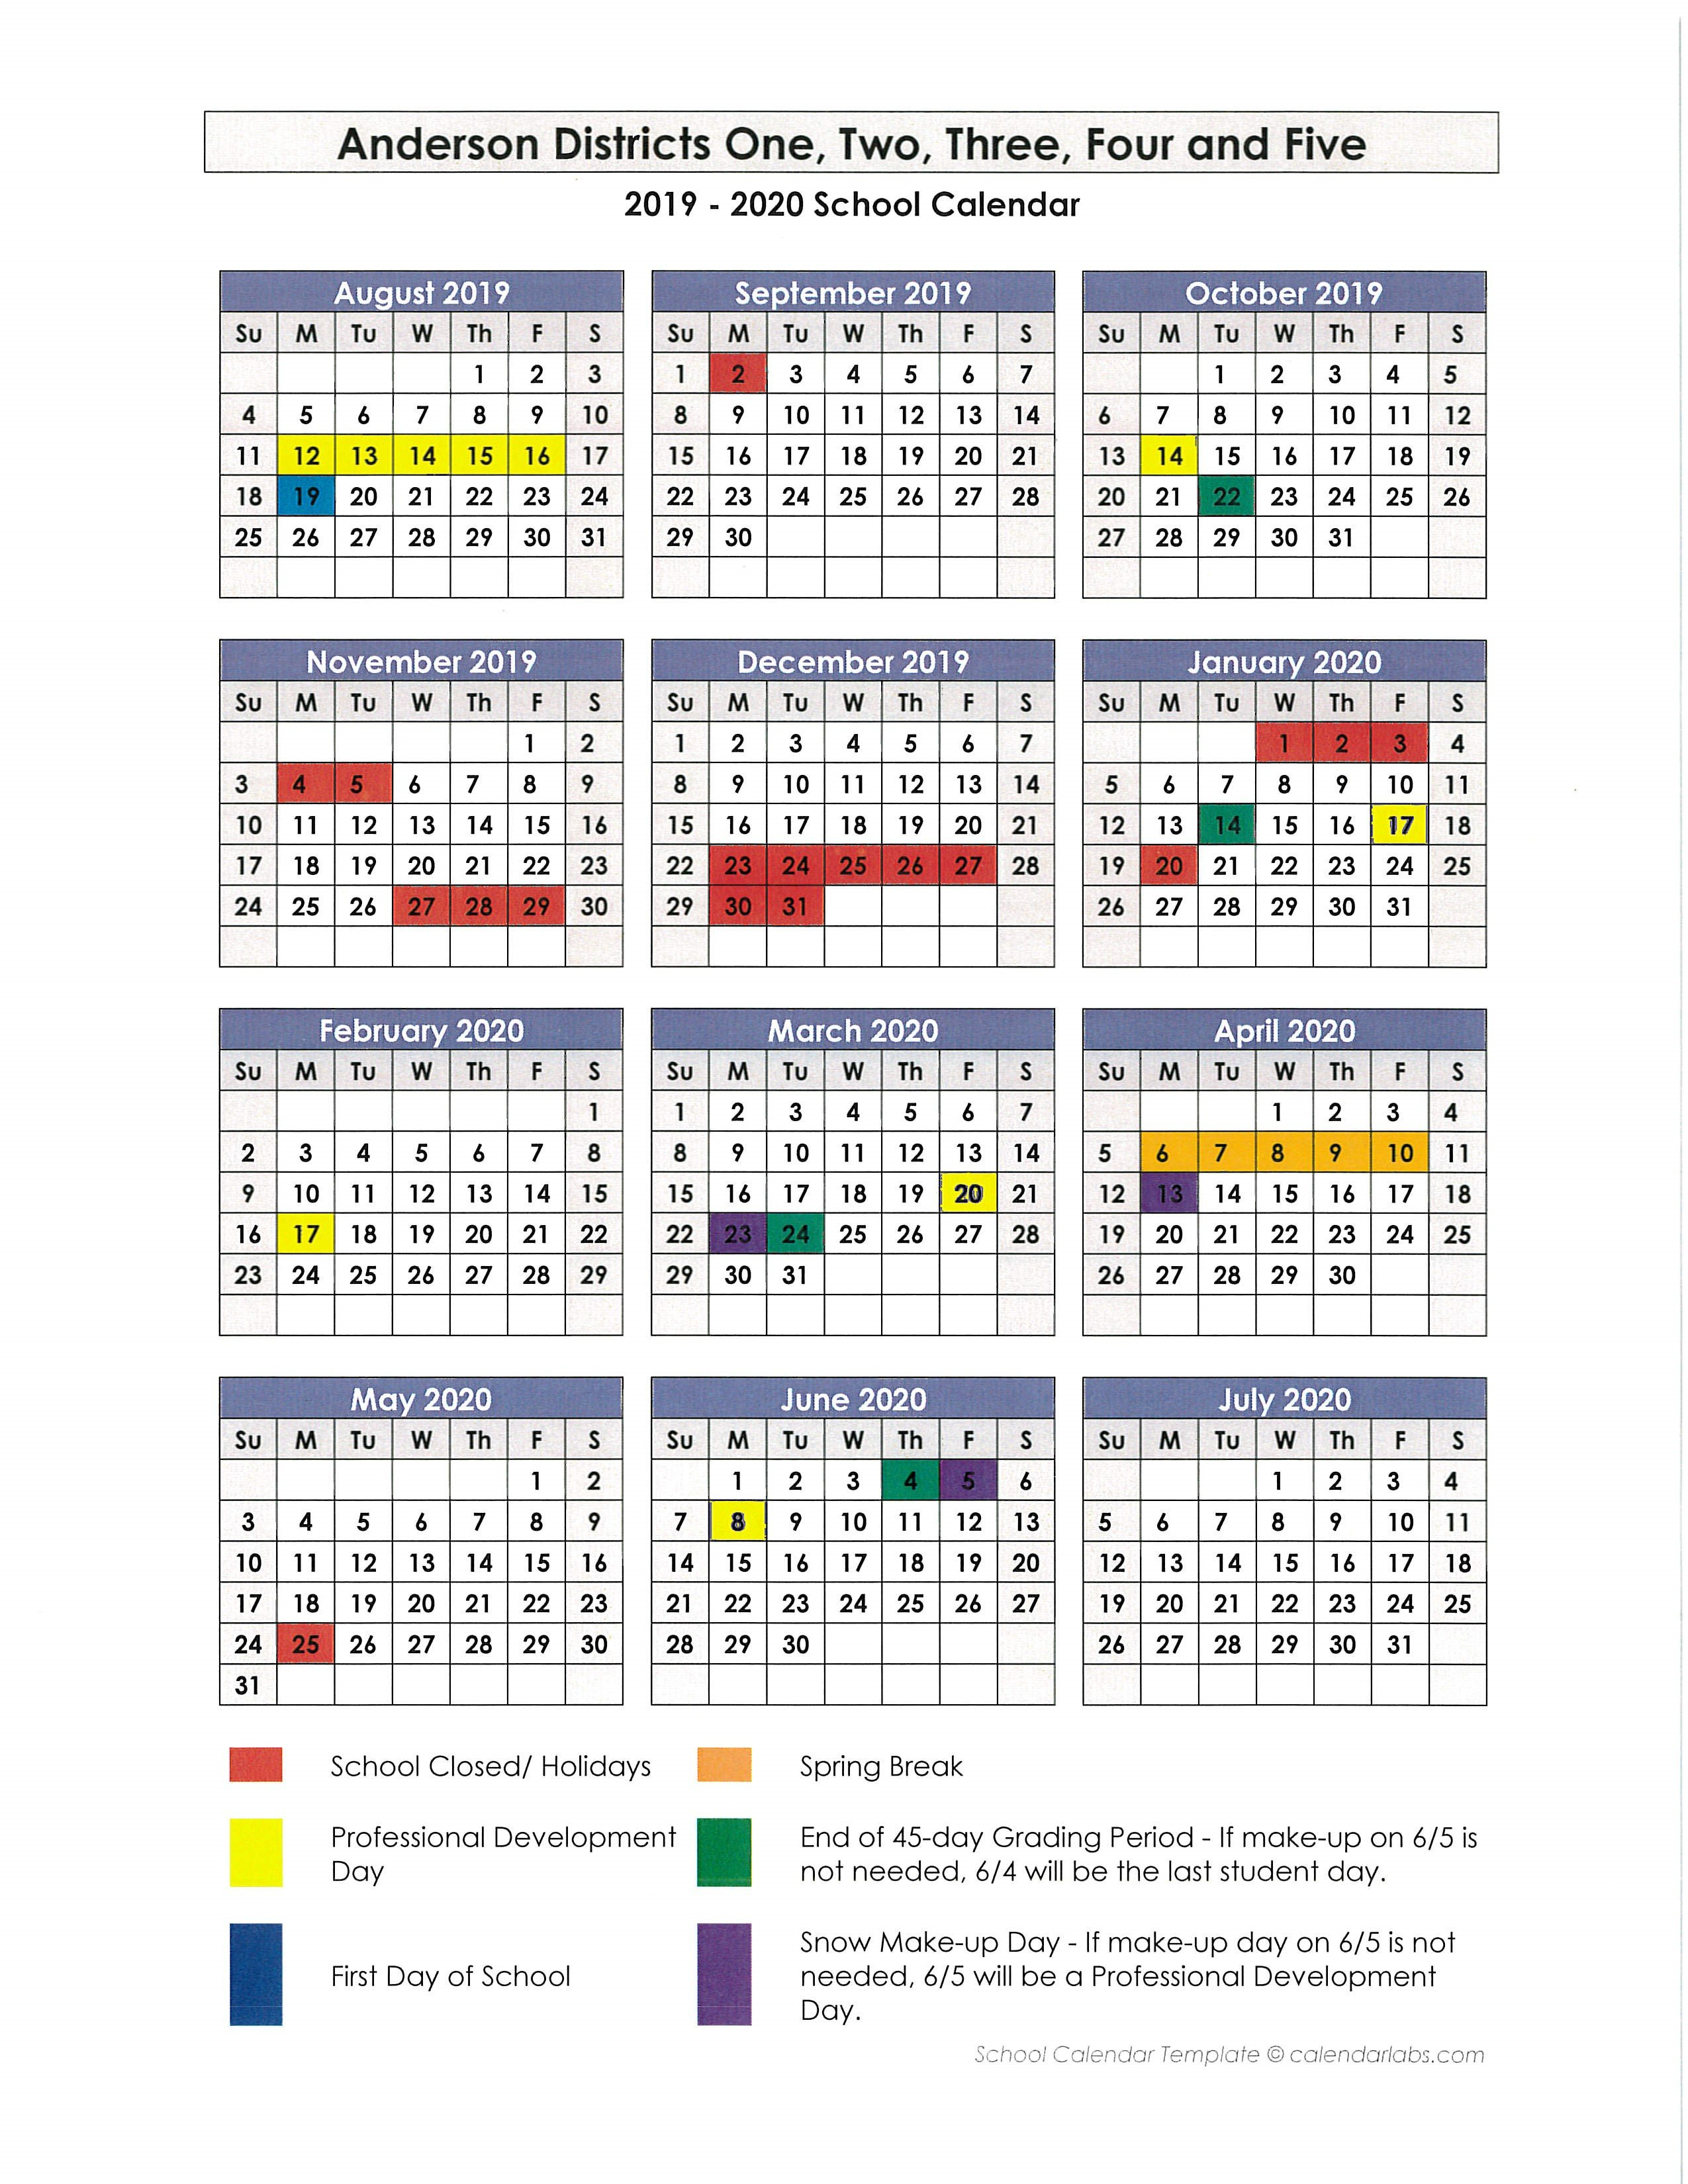 Anderson School District 1 Calendar 2019 And 2020 – Publicholidays School District 2 Calendar 2019